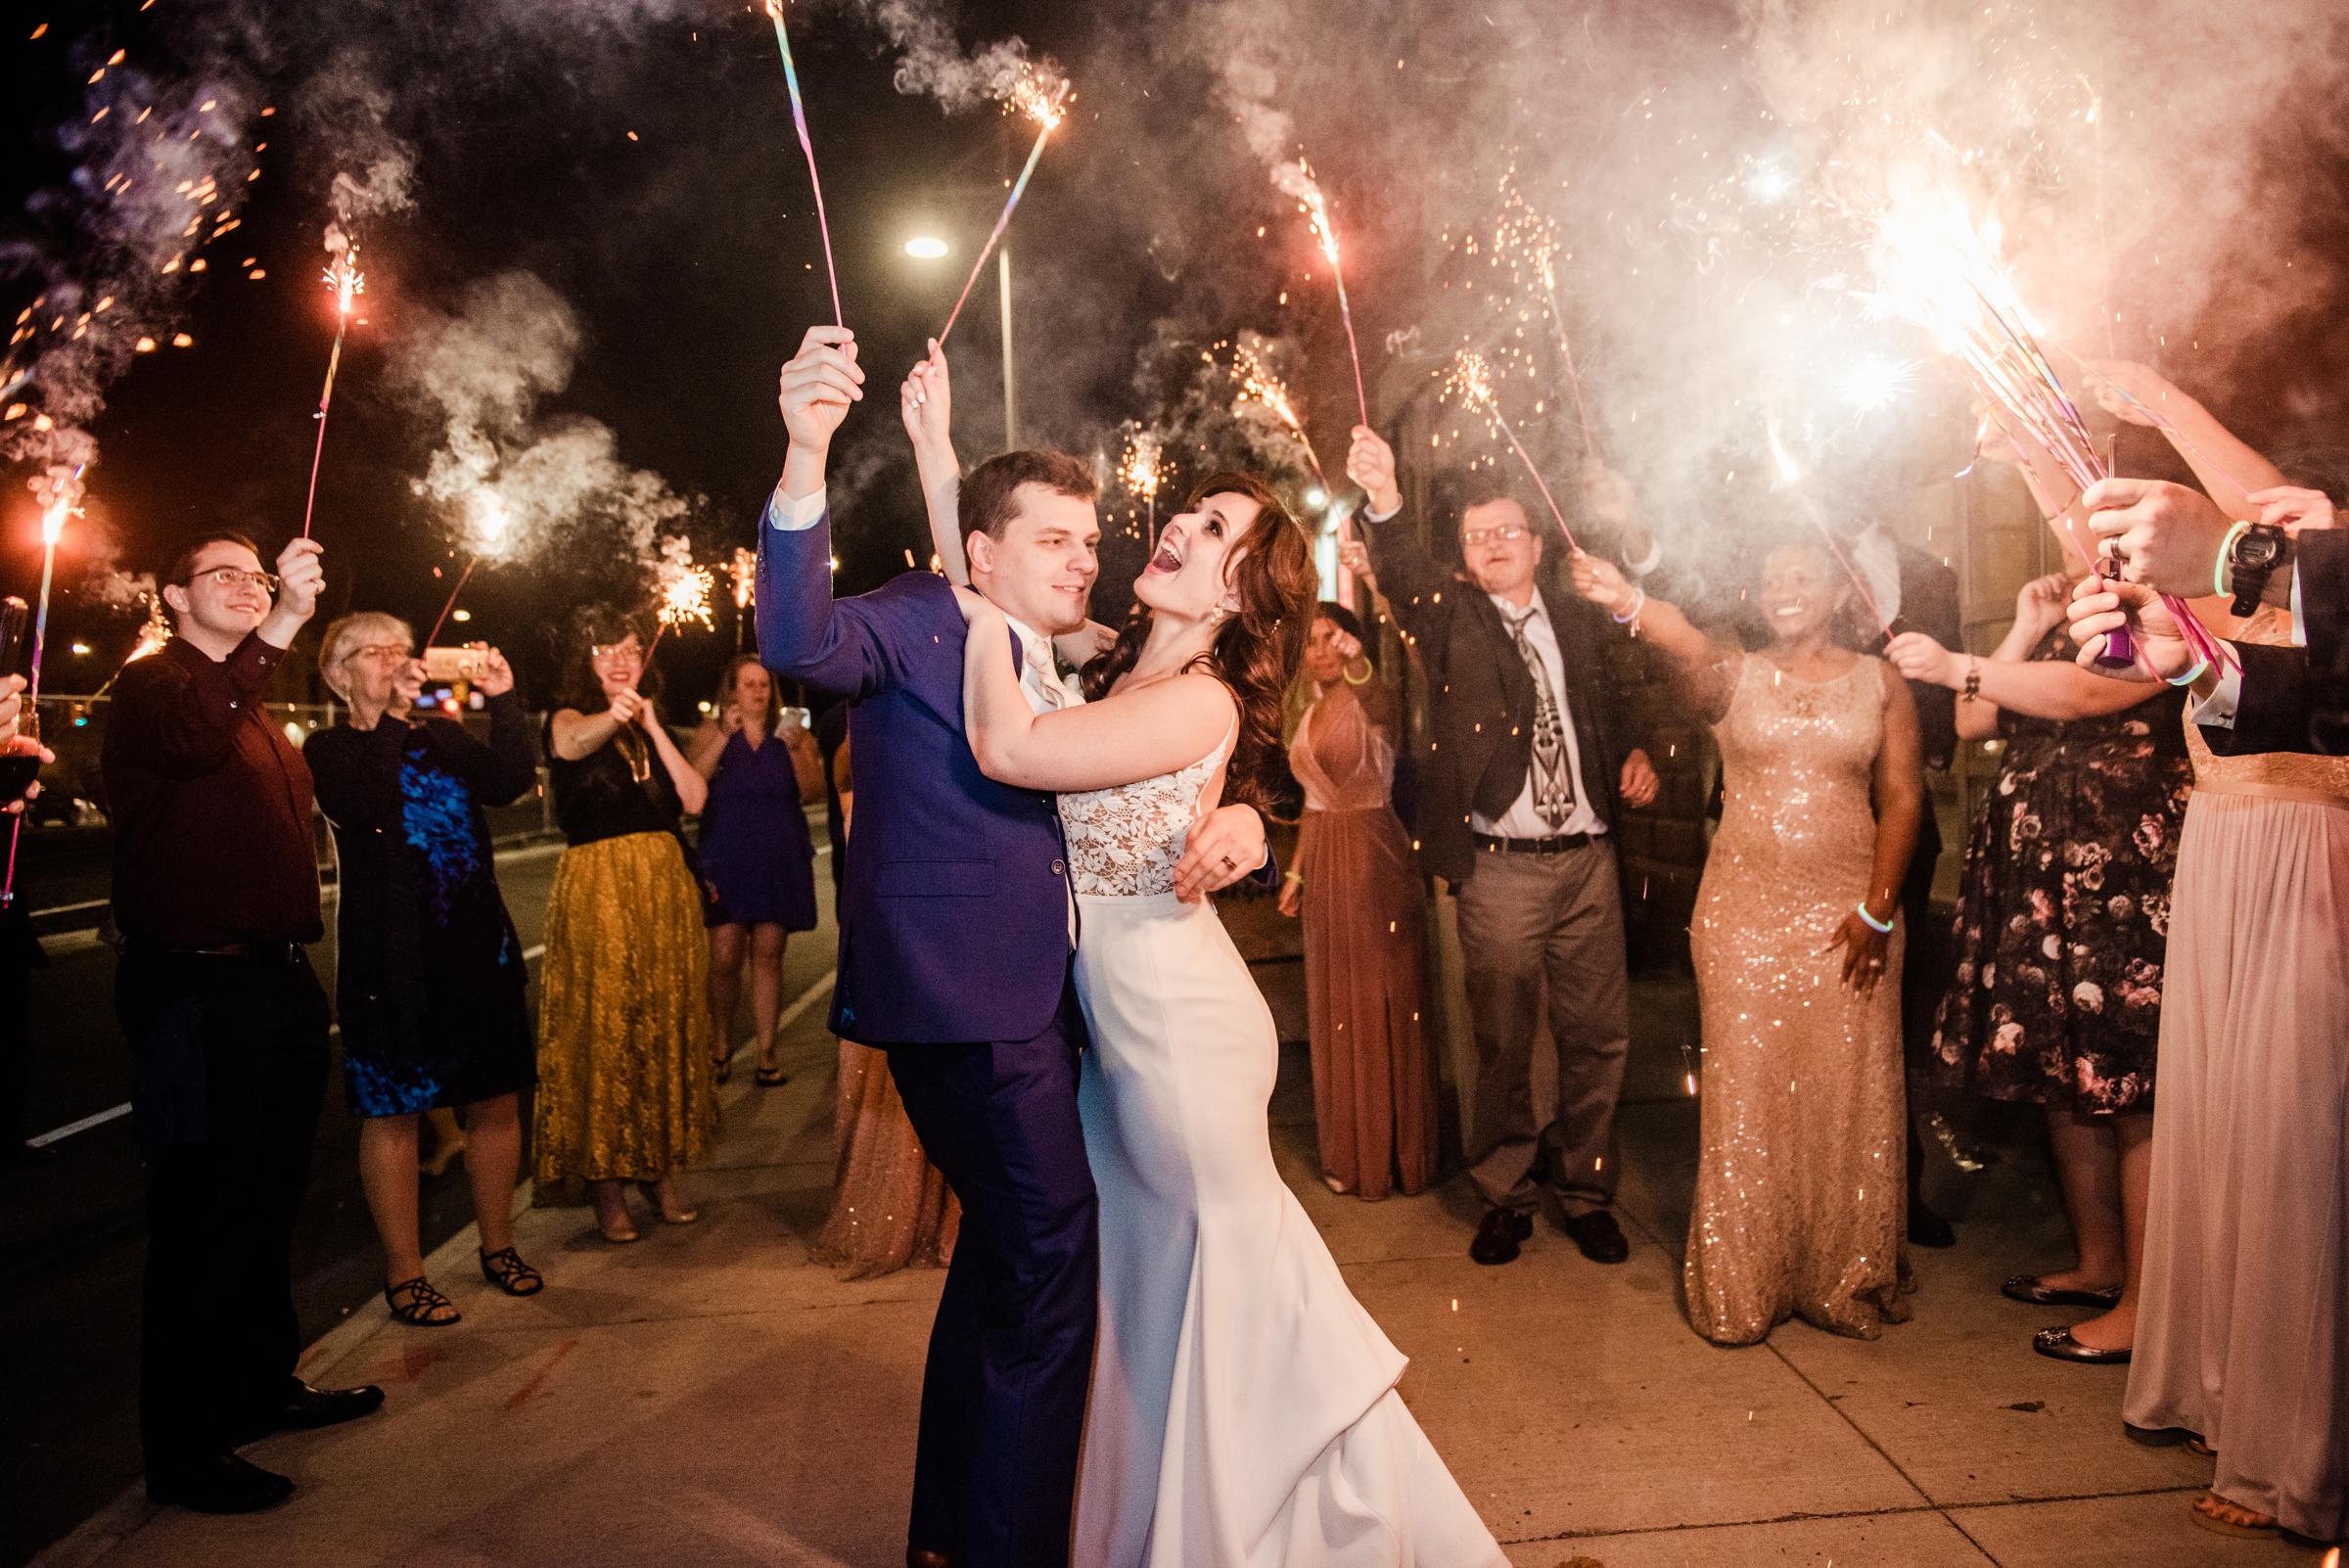 The_Arbor_LoftRochester_Wedding_JILL_STUDIO_Rochester_NY_Photographer_205209.jpg